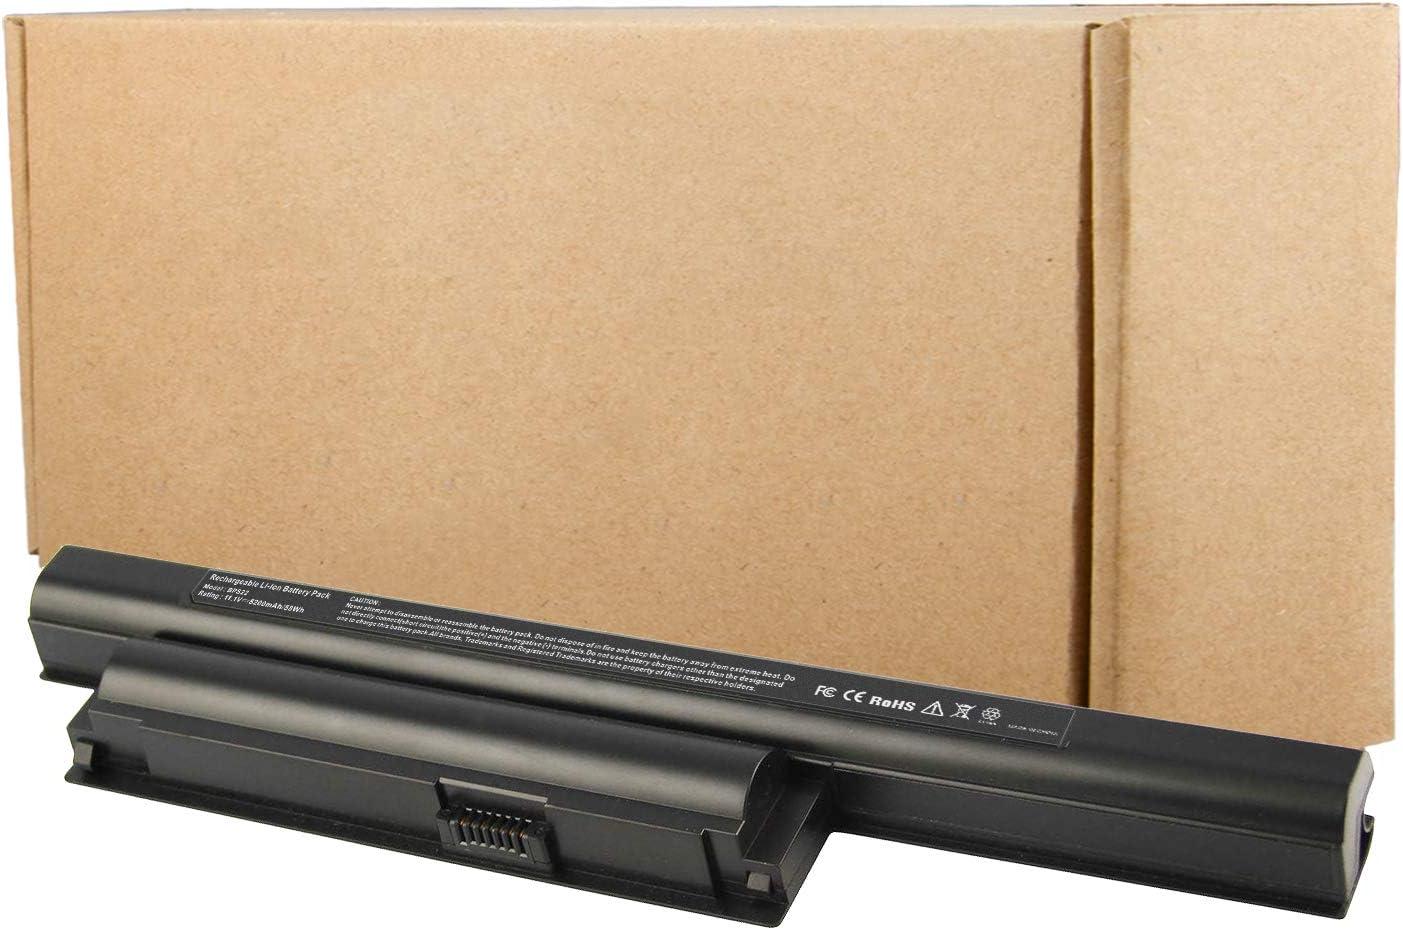 'ARyee VGP-BPS22 Battery Compatible with Sony VGP-BPS22 VGP-BPS22A VGP-BPL22 VGP-BPS22/A VAIO VPC-E1Z1E VPC-EA VPCEA24FM VPCEE22FX VPCEE23FX(5200mAh 11.1V)